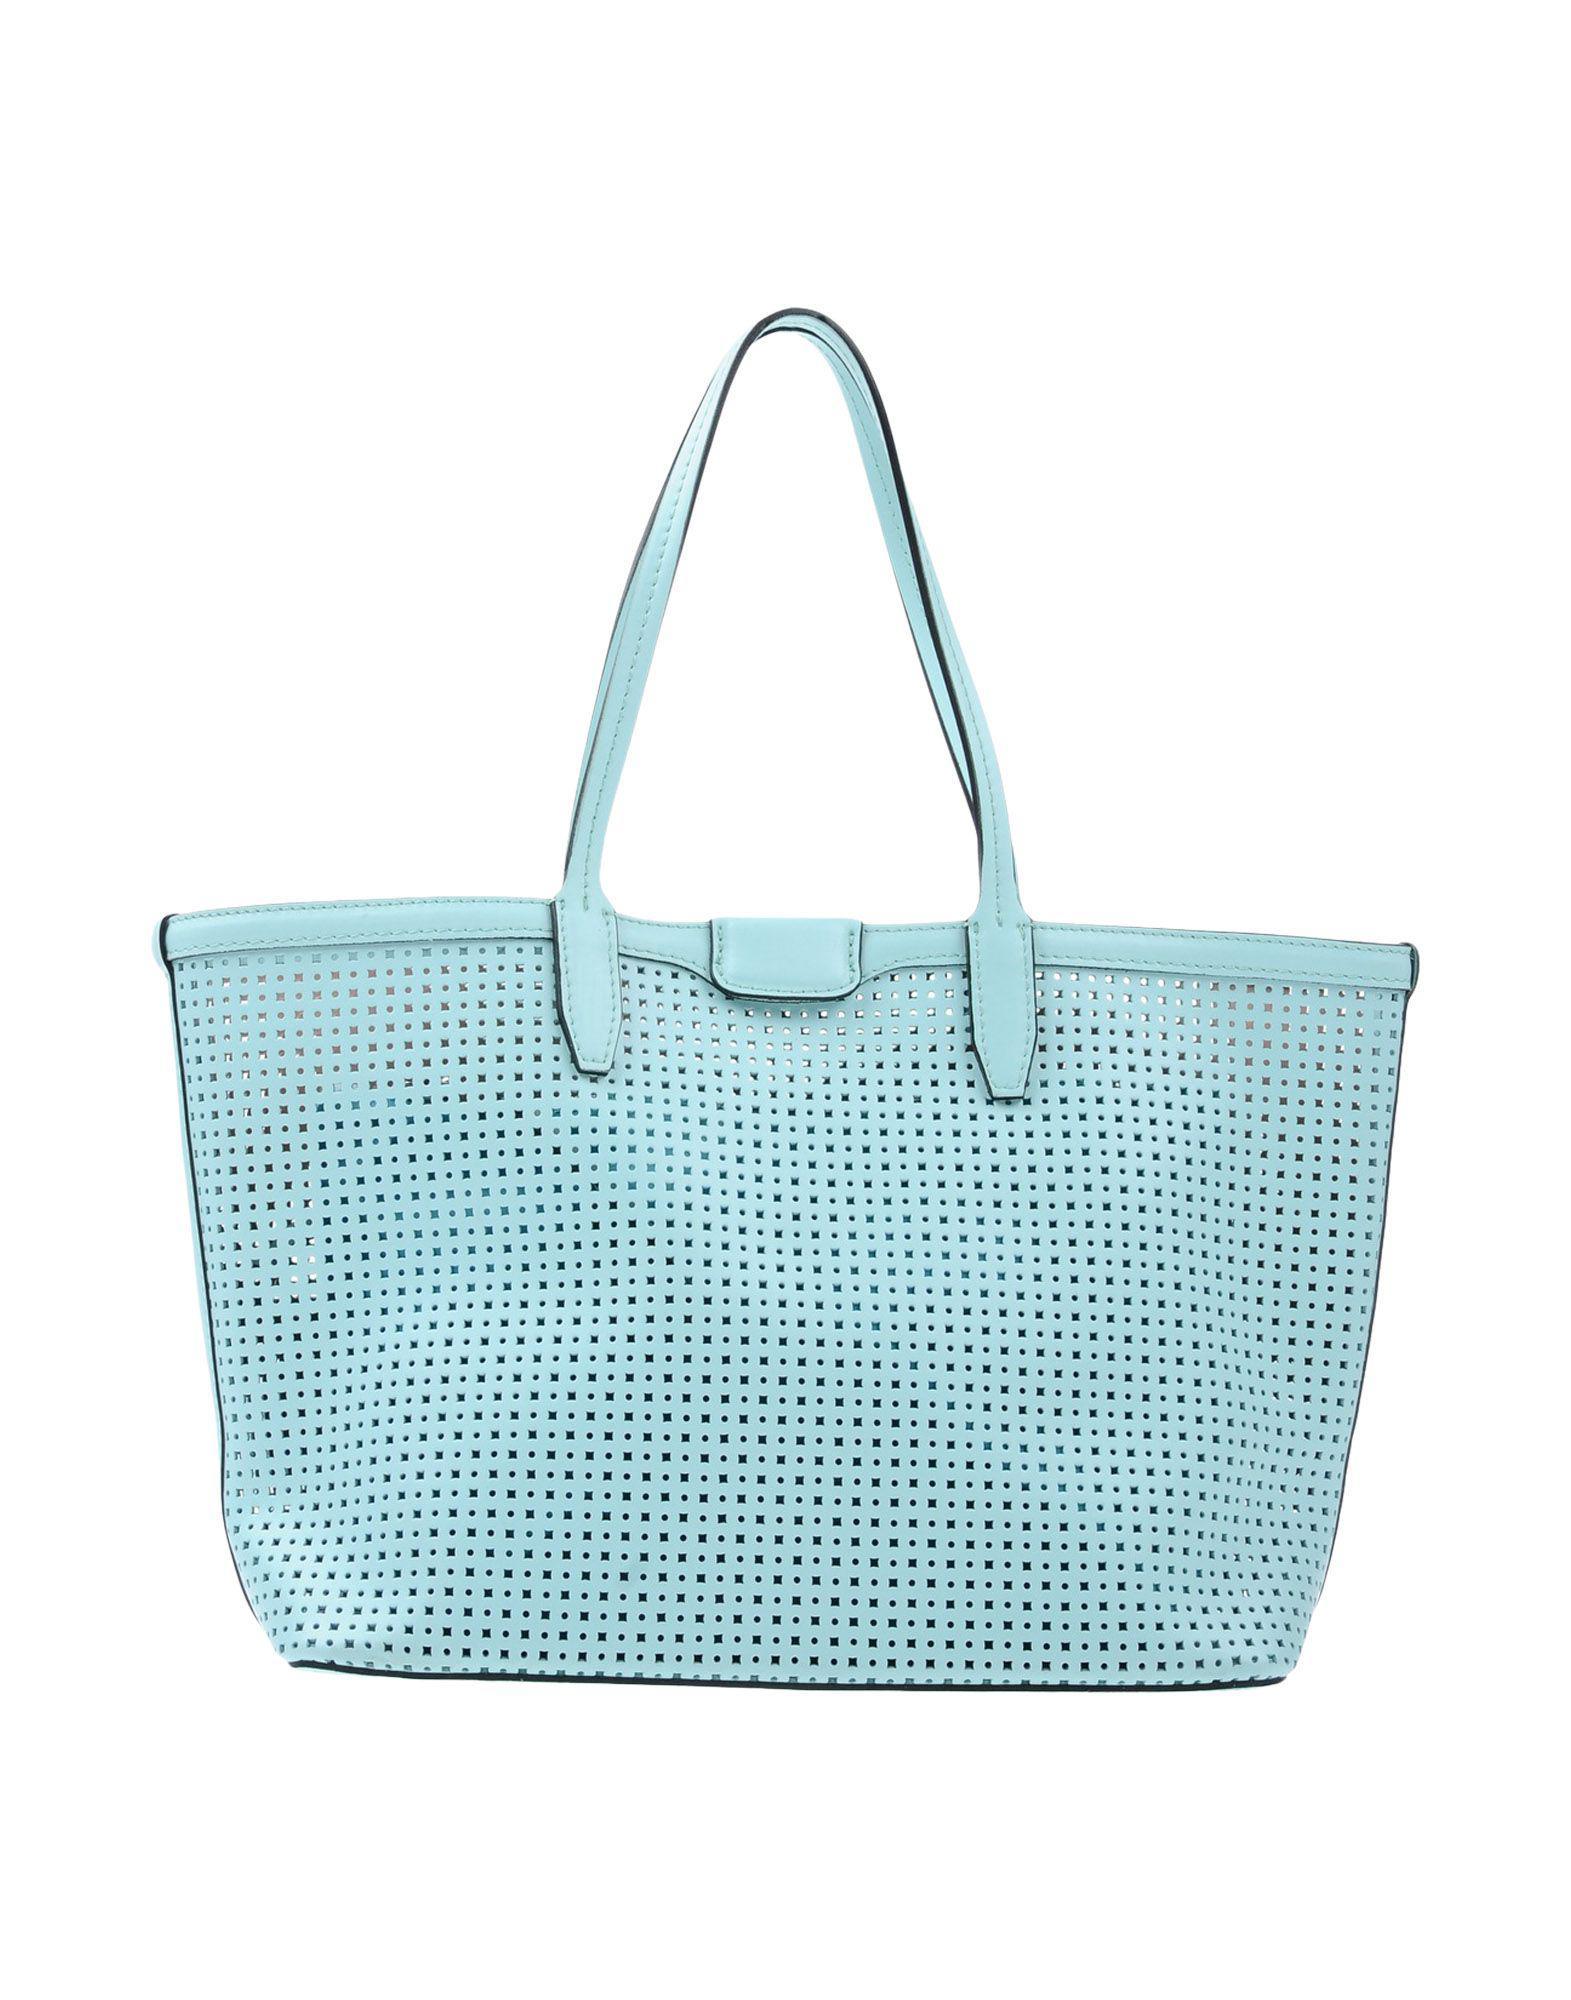 6d5b9b629aef59 Lyst - Gianni Chiarini Handbag in Blue